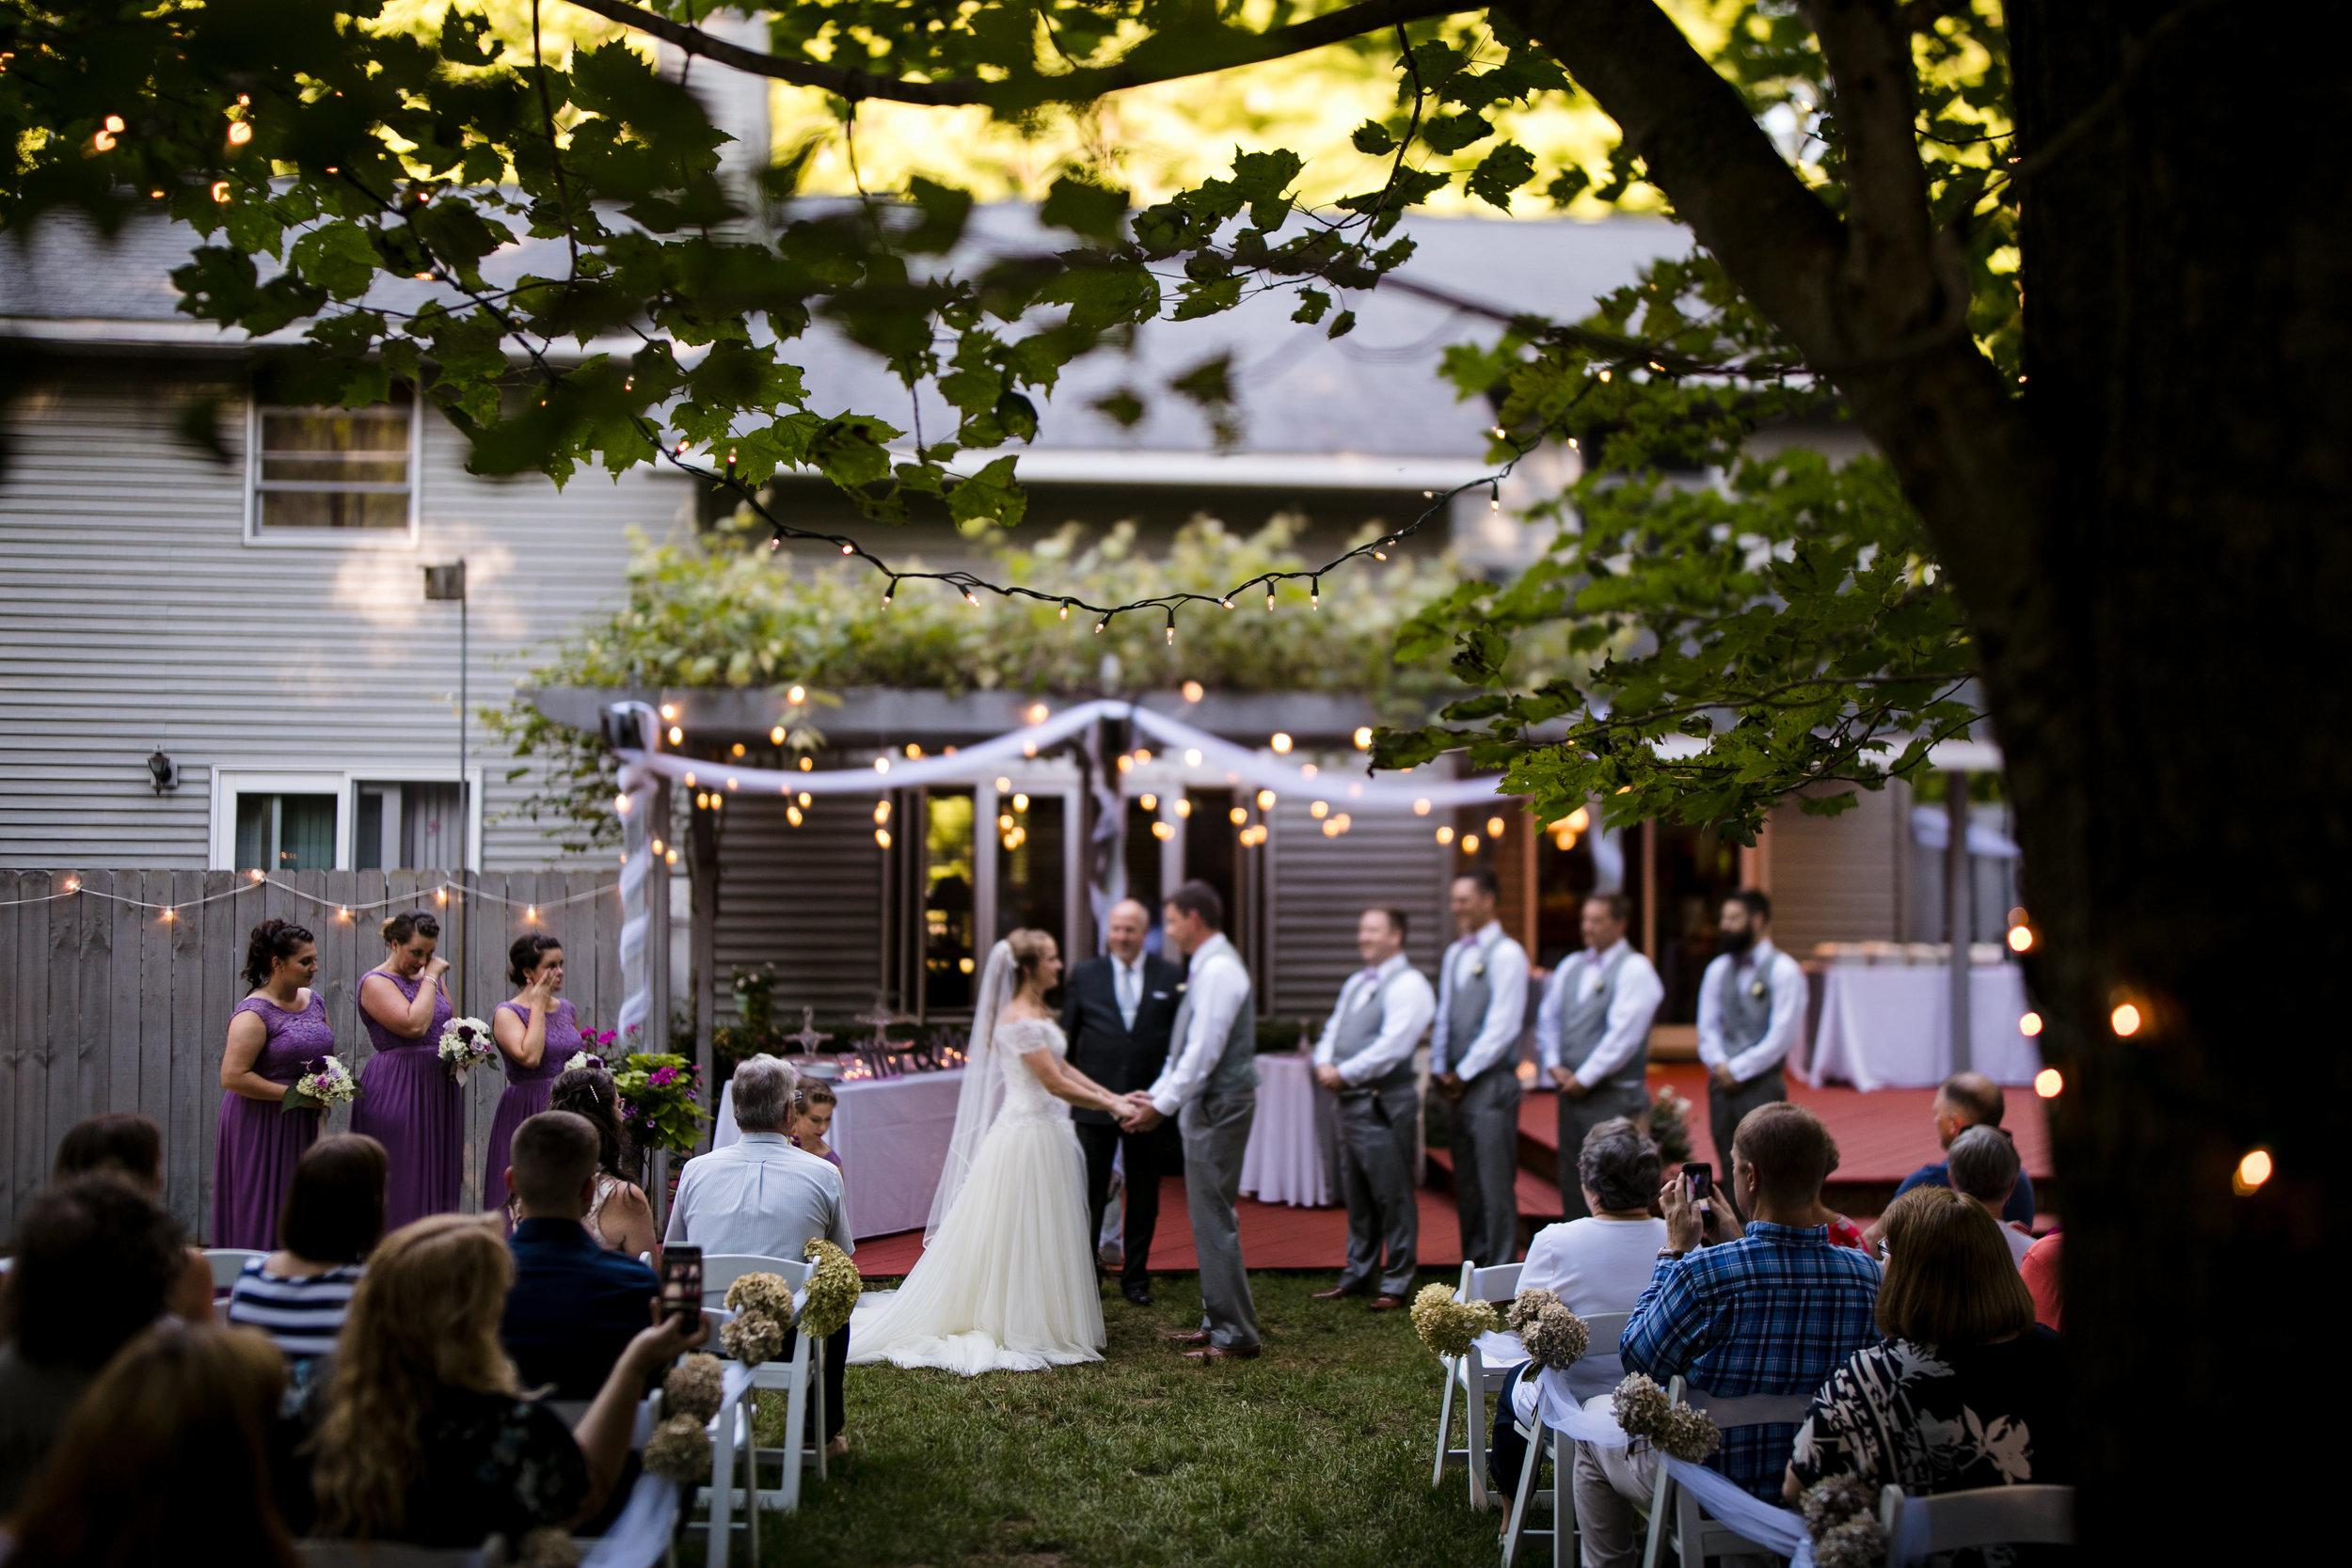 ludington-michigan-intimate-backyard-wedding-jessica-nolan256.jpg